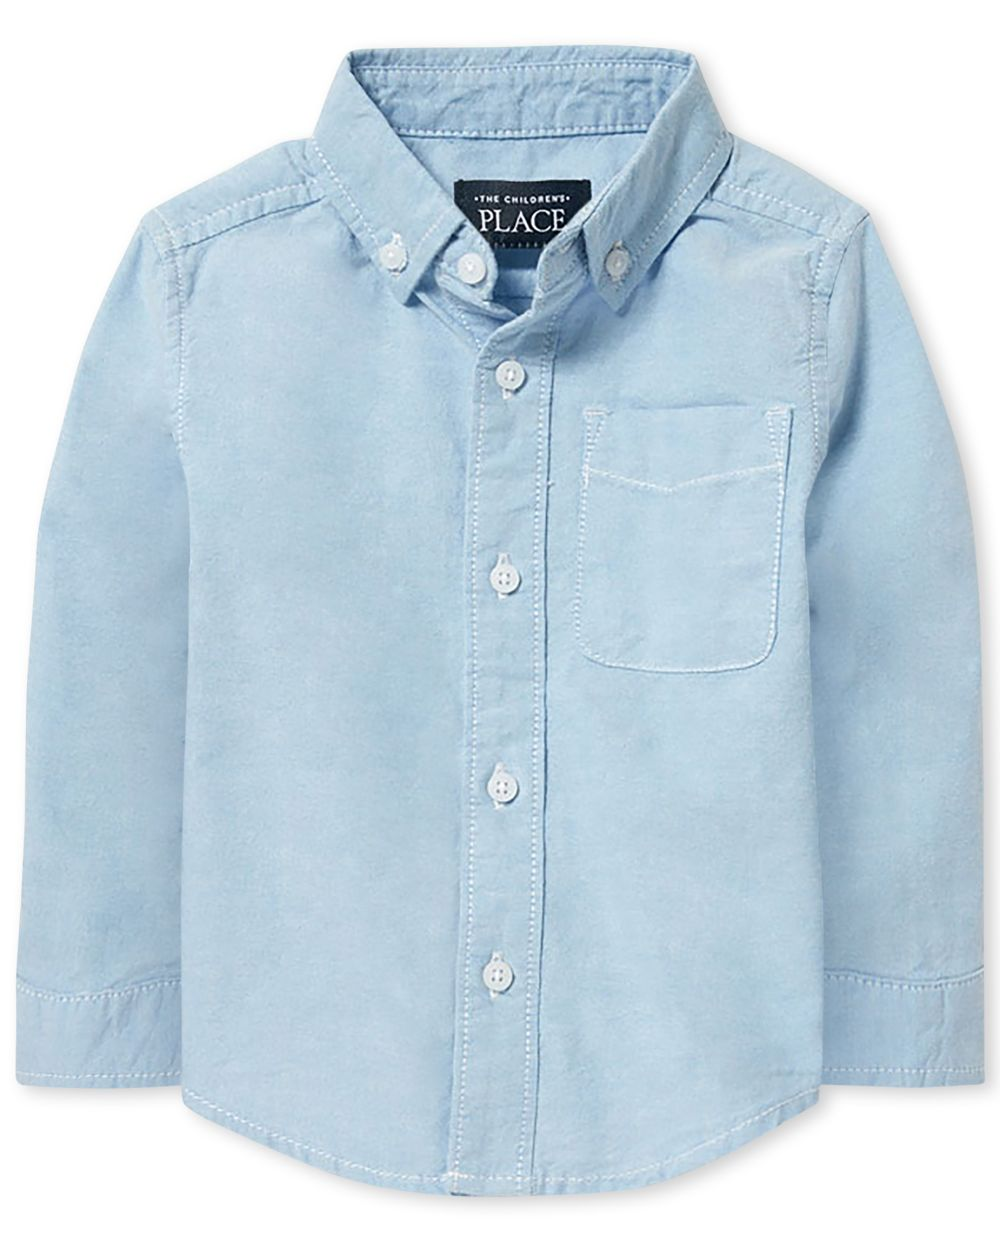 Toddler Boys Oxford Button Down Shirt